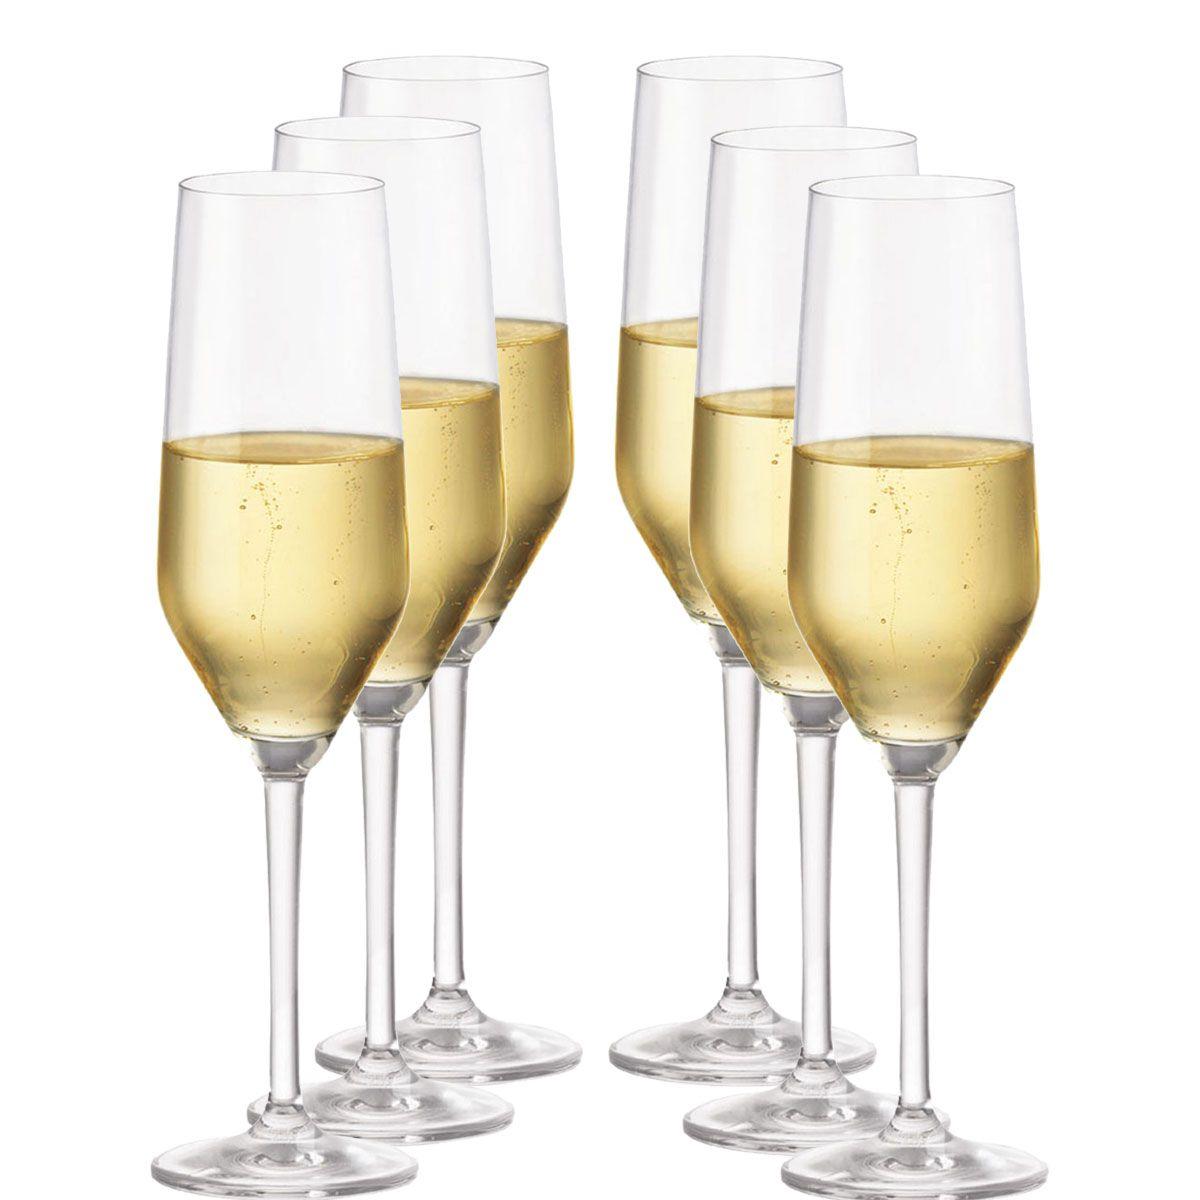 Taça Champagne Cristal - Taça Champanhe Elegance 260ml 6pc